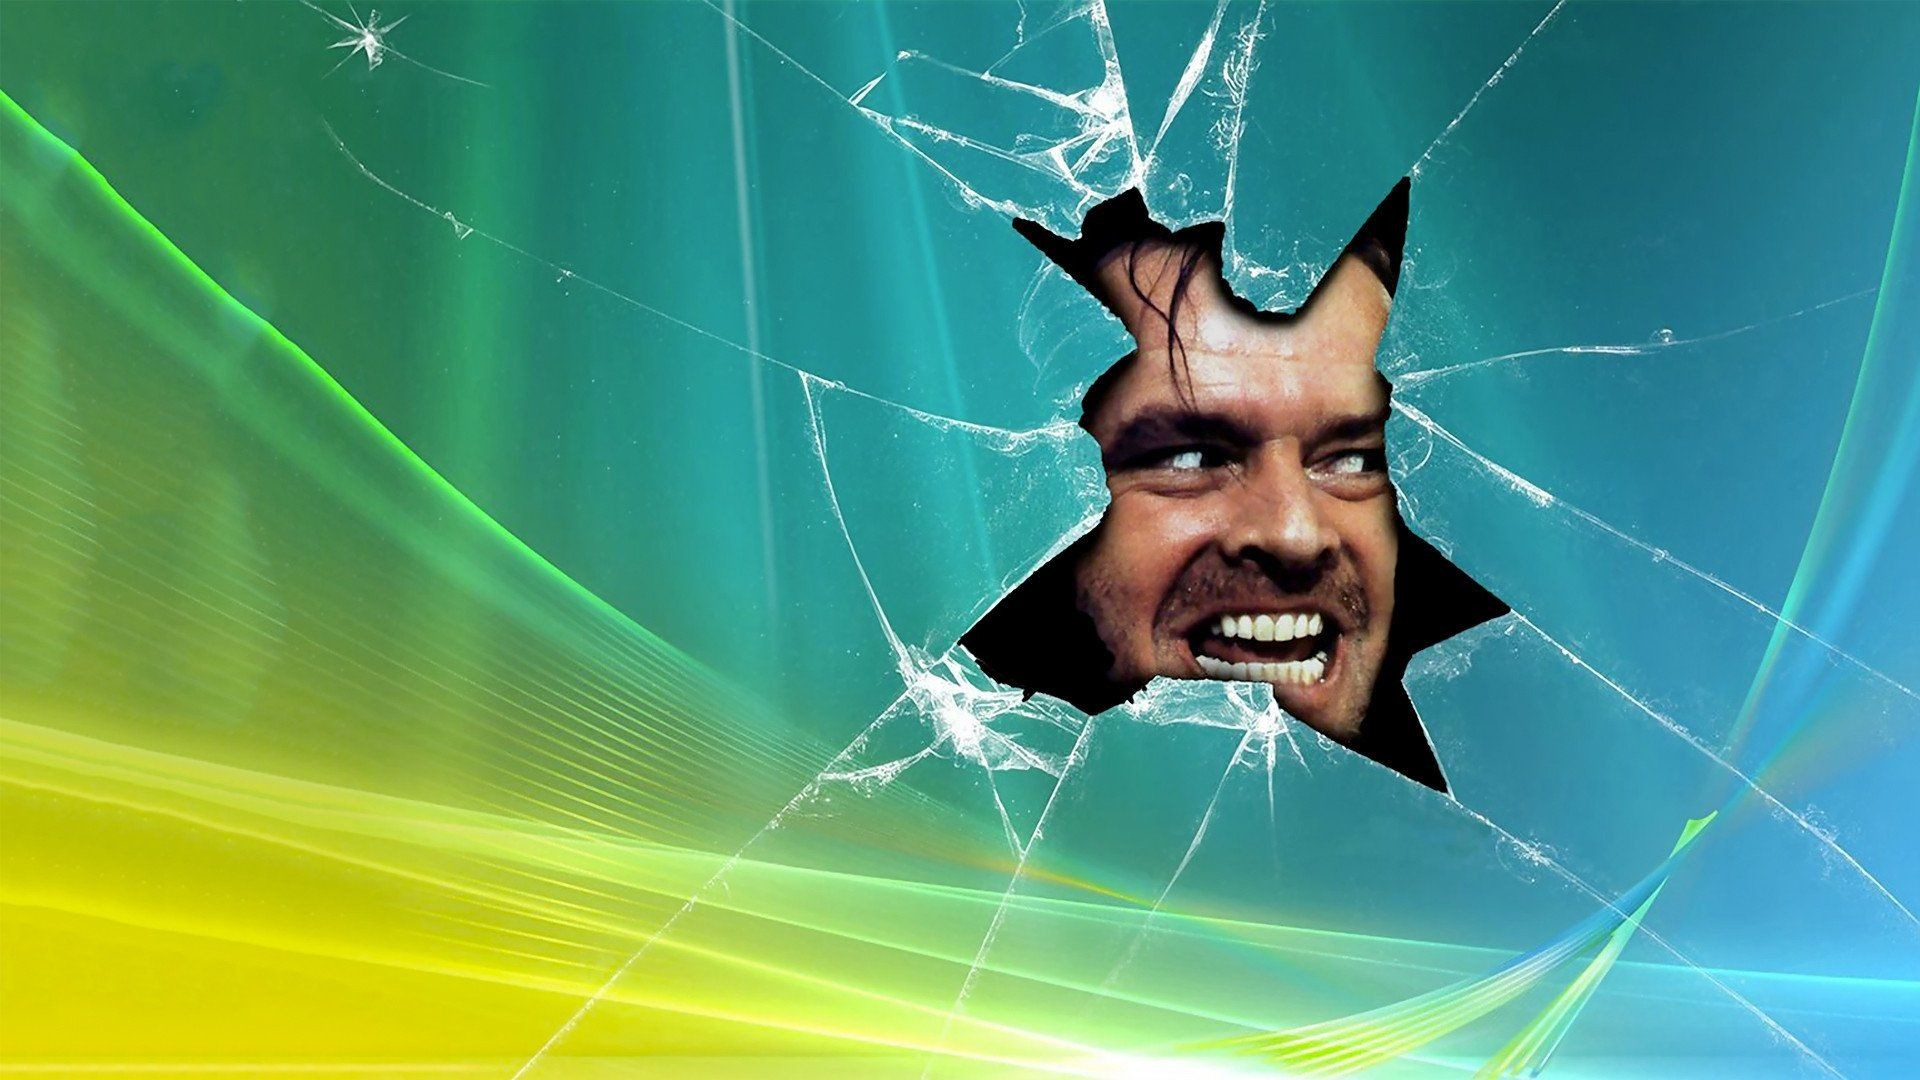 THE SHINING horror thriller dark movie film classic shatter glass .